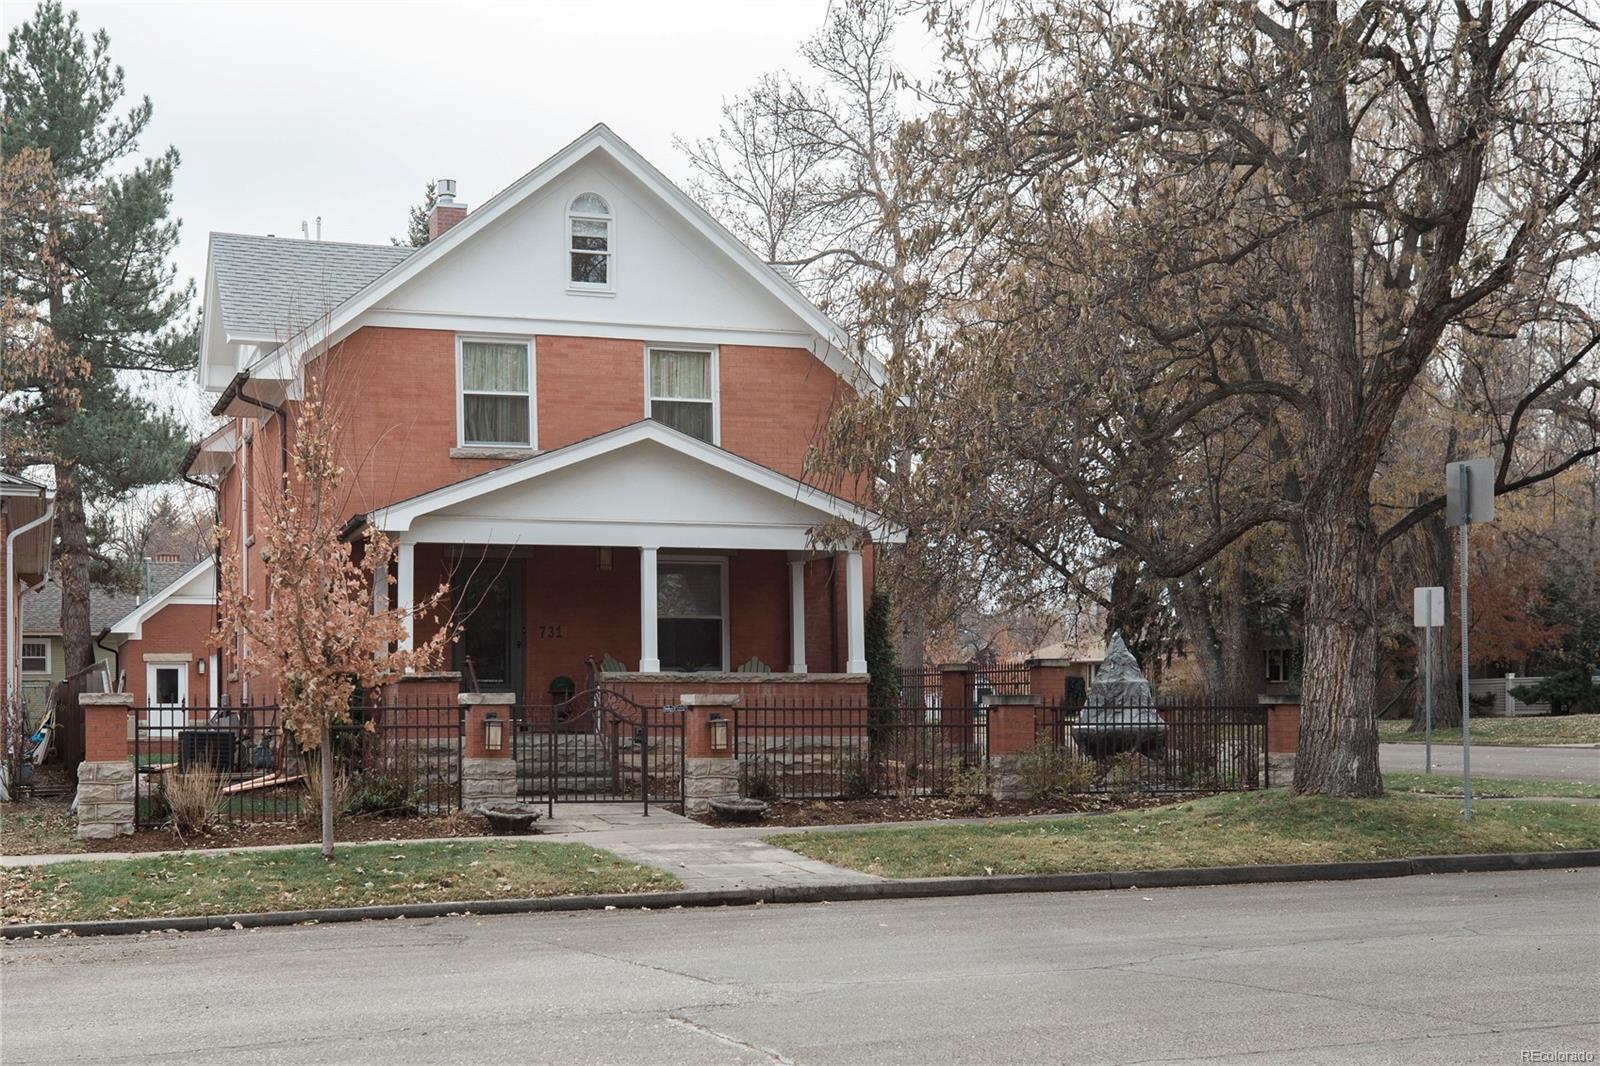 731 W Olive Street, Fort Collins, CO 80521 - Fort Collins, CO real estate listing